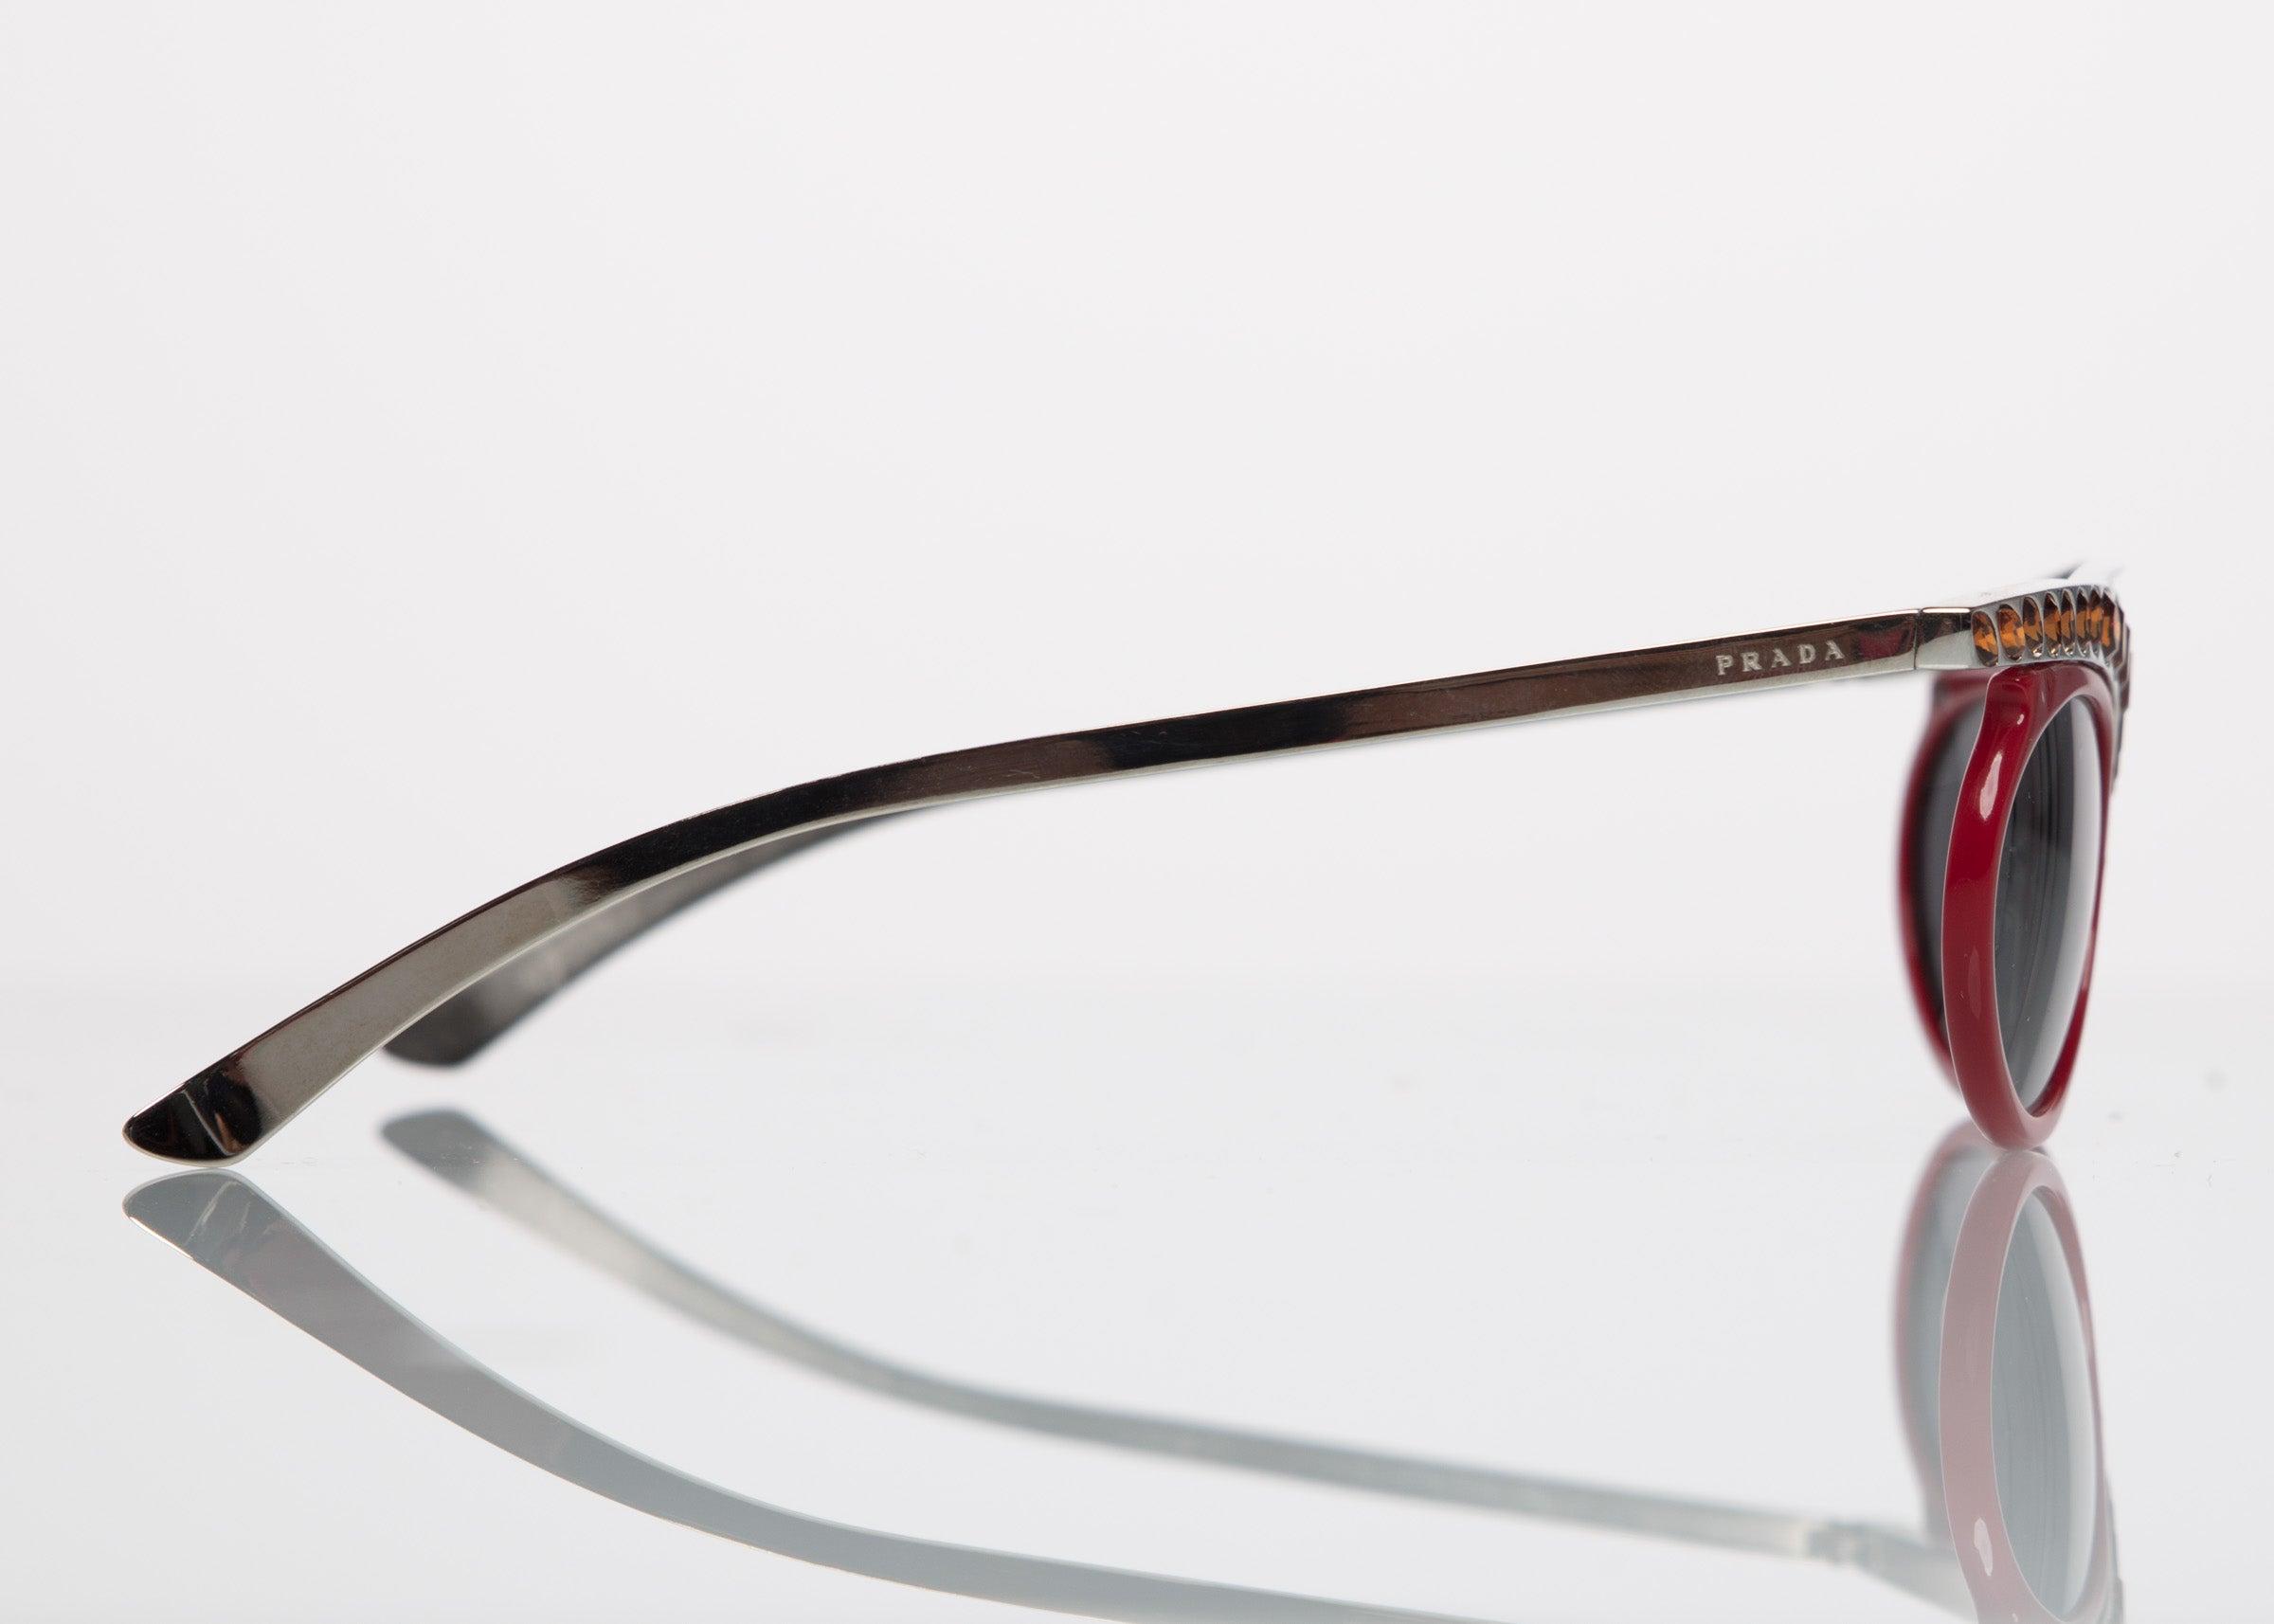 0a17cf40af7f ... netherlands 2012 prada runway red cat eye amber crystal sunglasses for  sale at 1stdibs 4b646 a886e